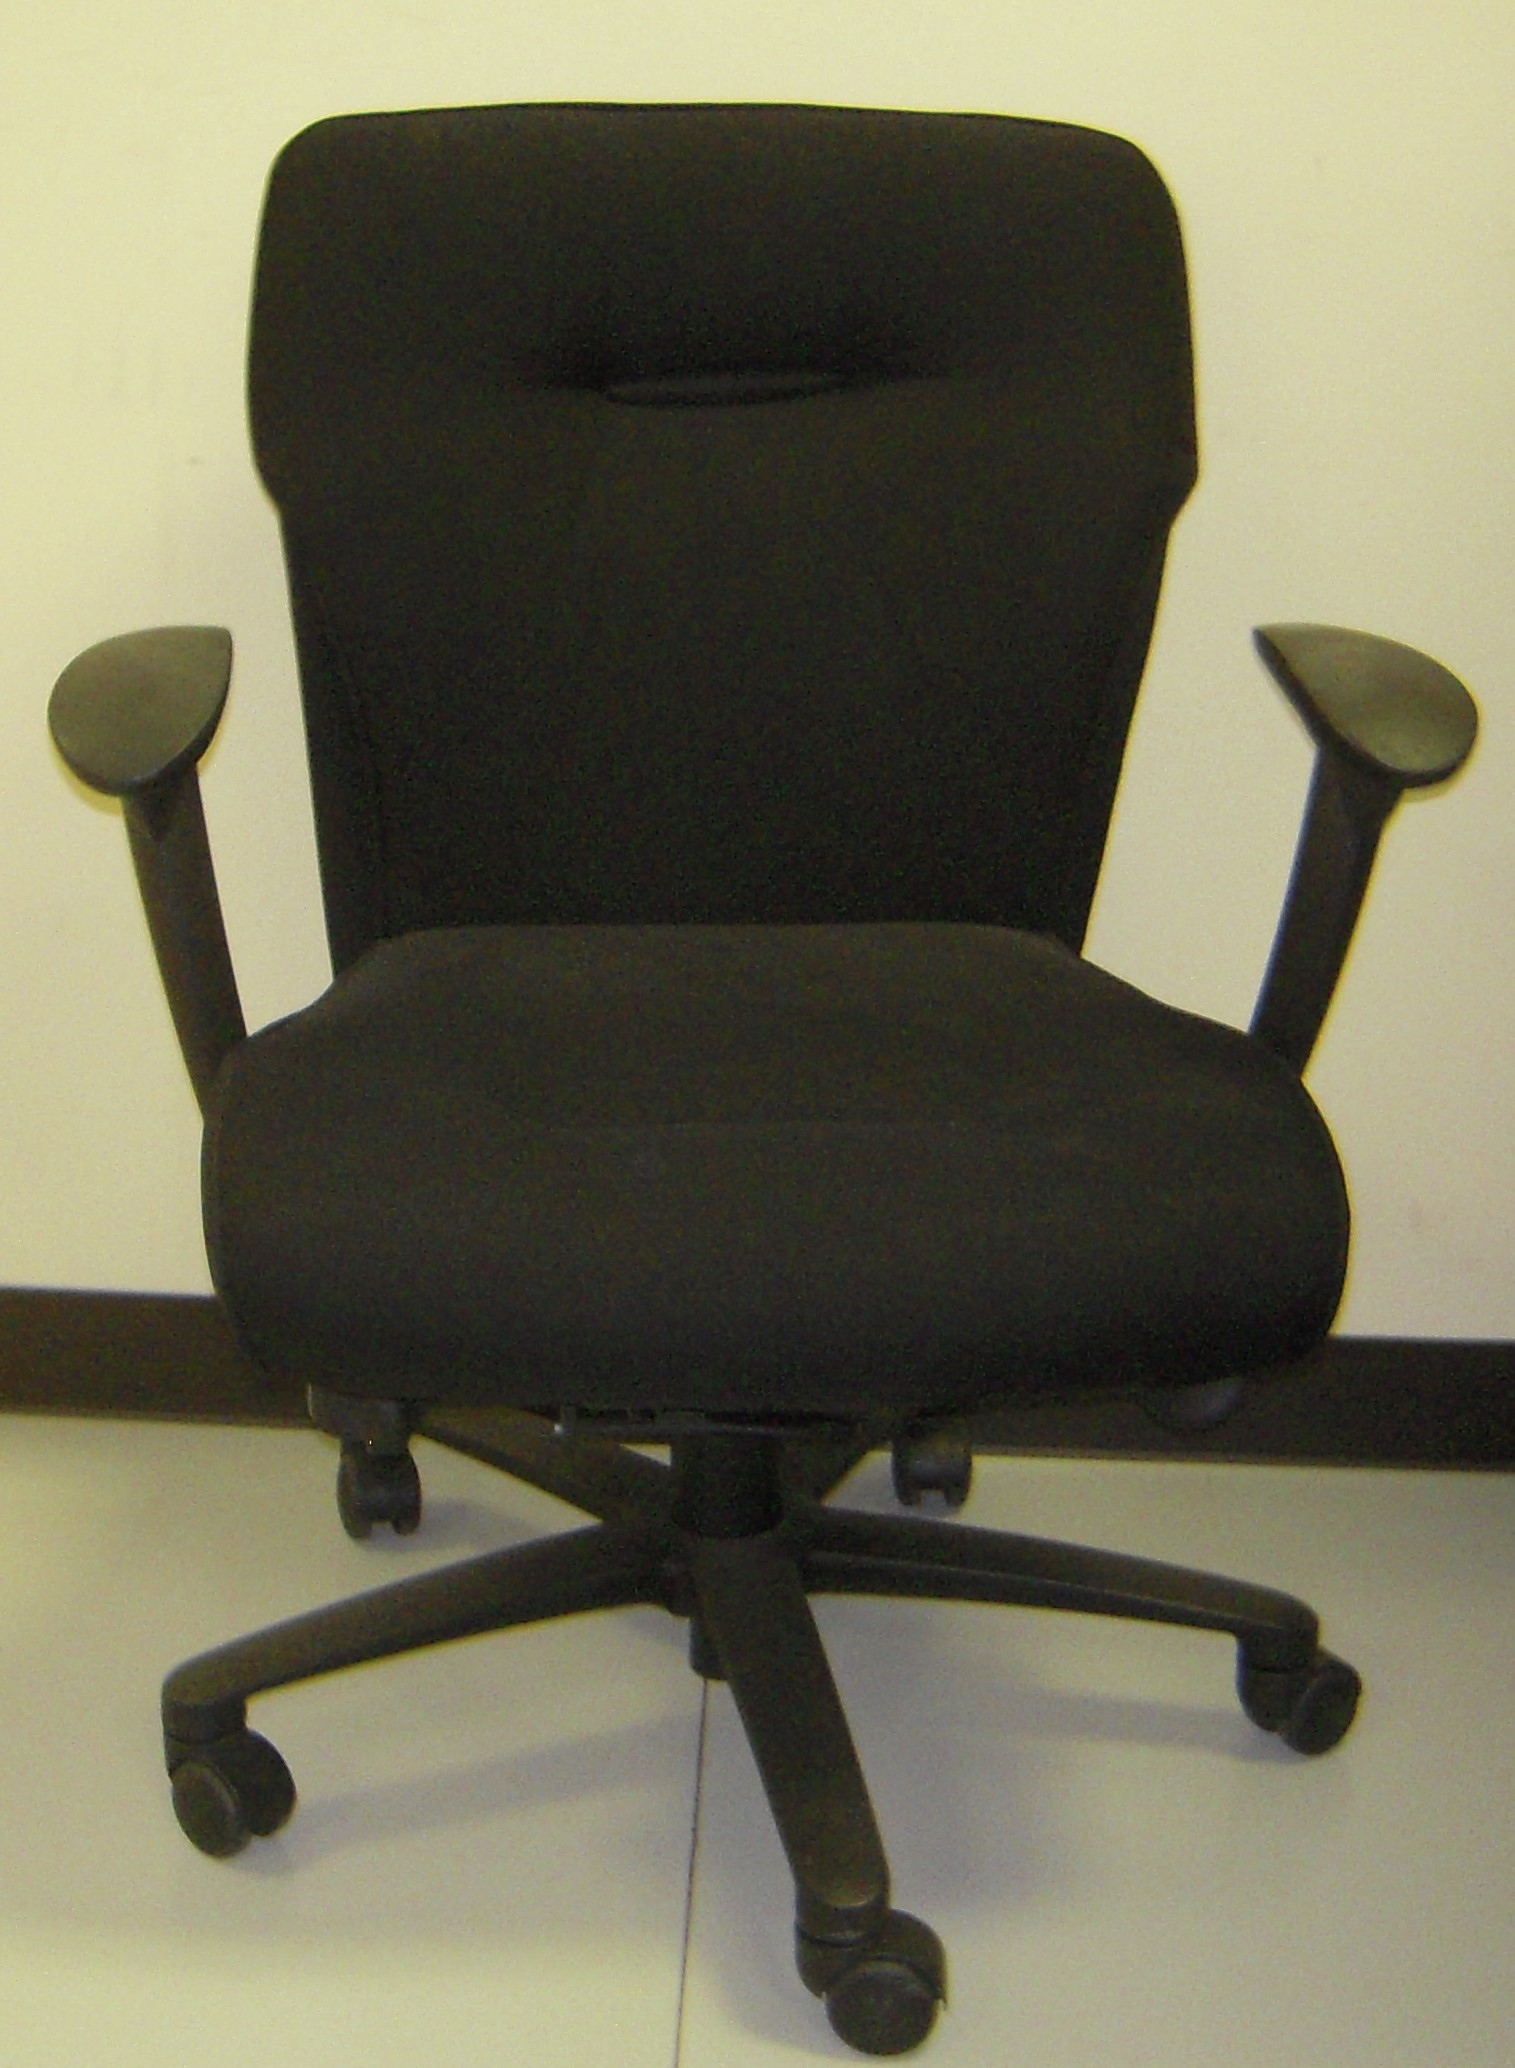 swivel chair office warehouse computer desk walmart brayton international furniture request a quote